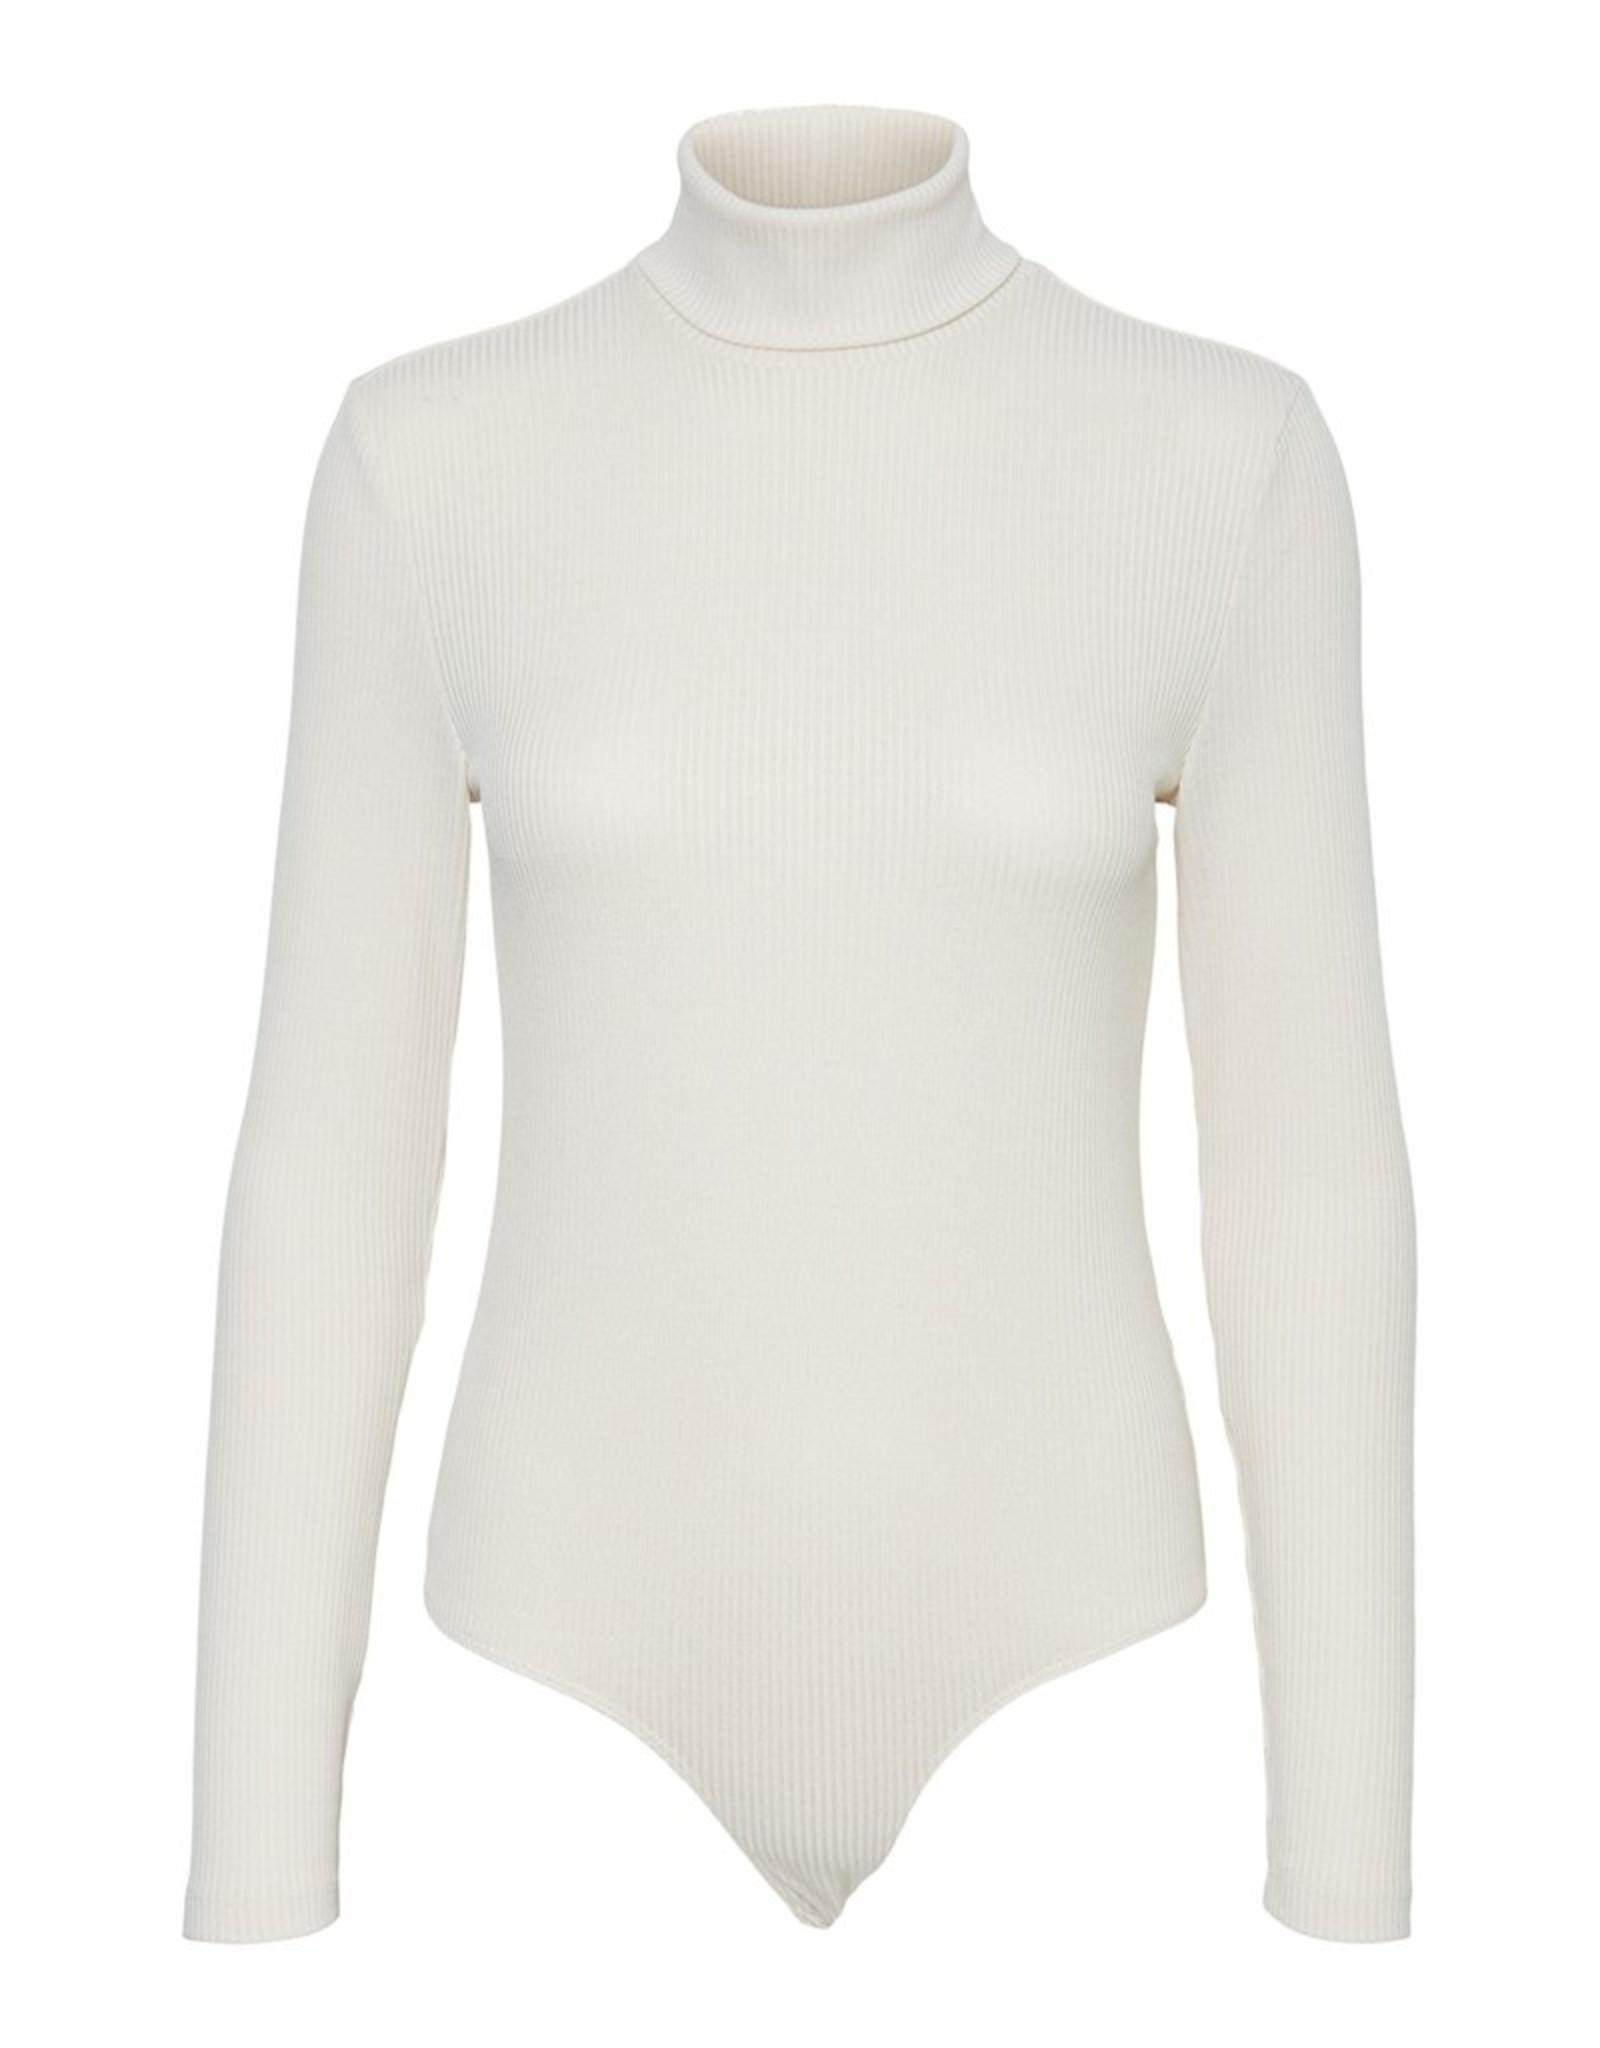 Vero Moda Ruthie Ribbed Turtleneck Bodysuit